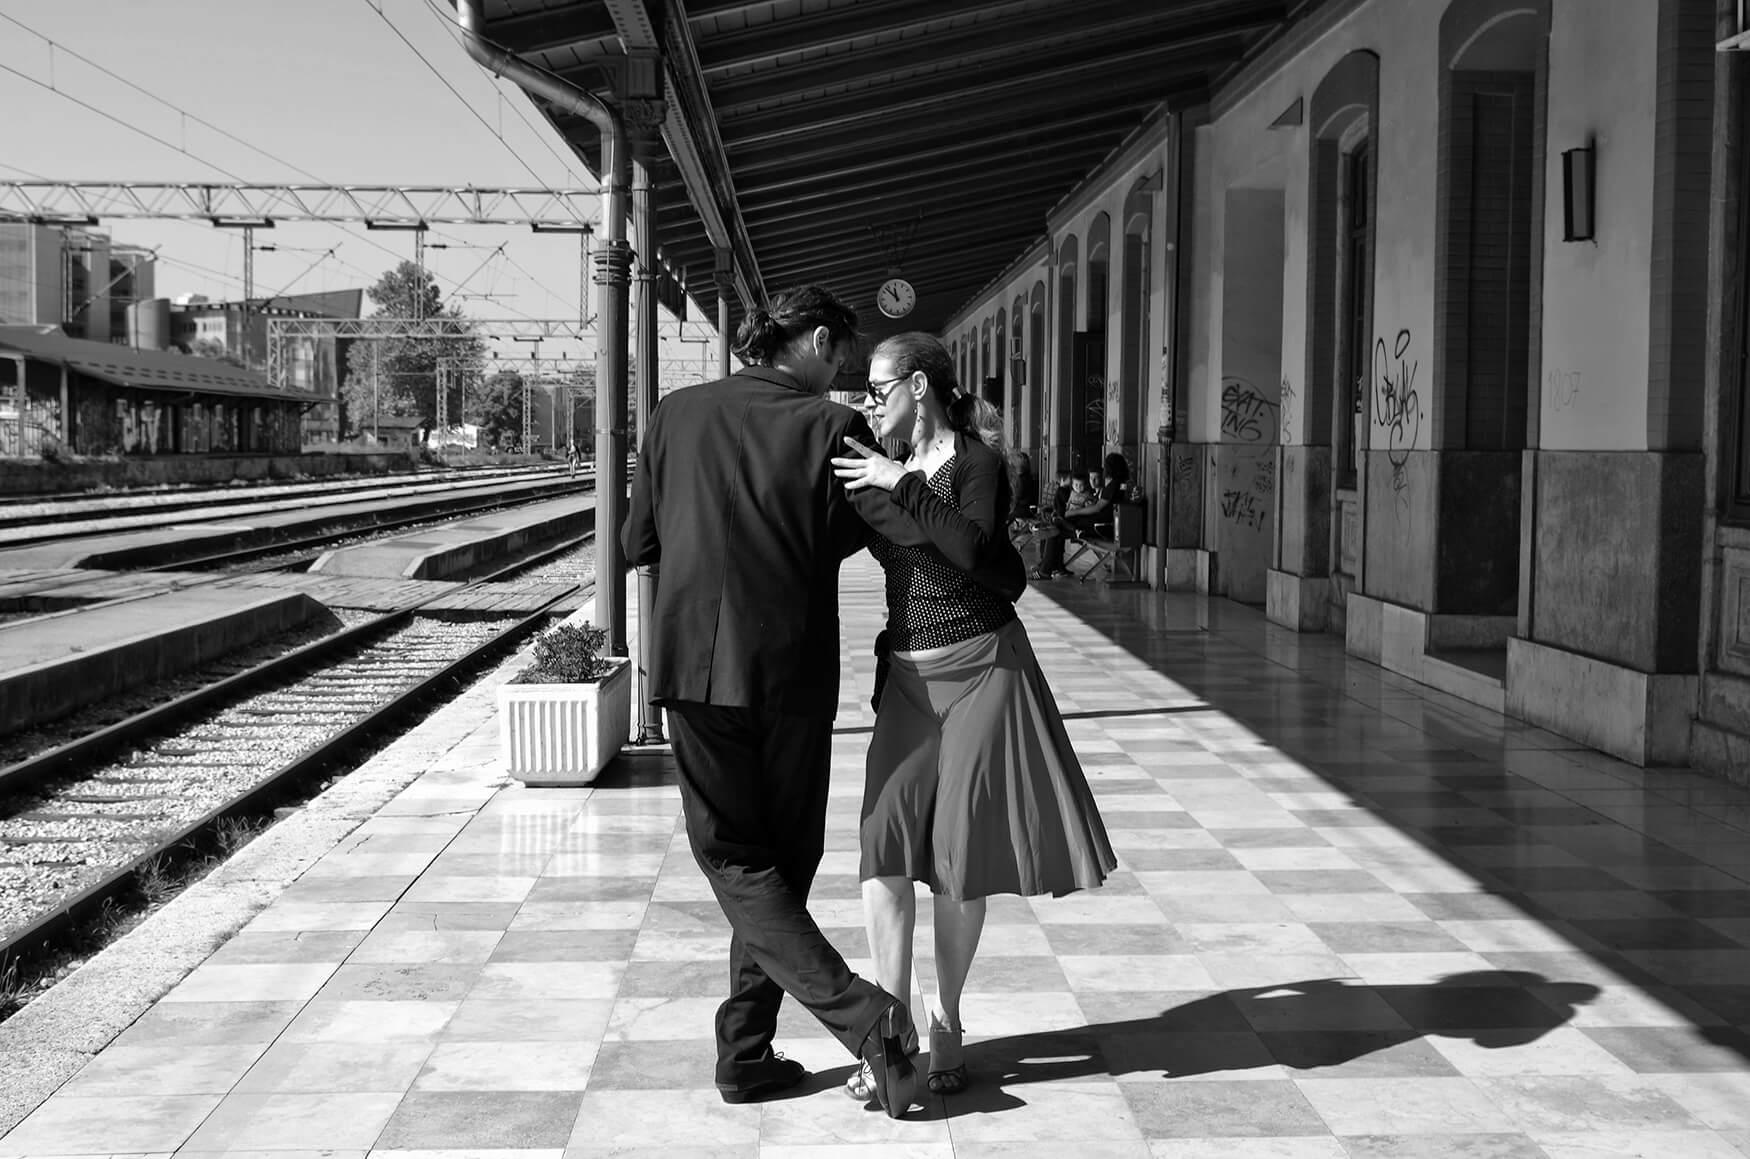 julija_domac_tango